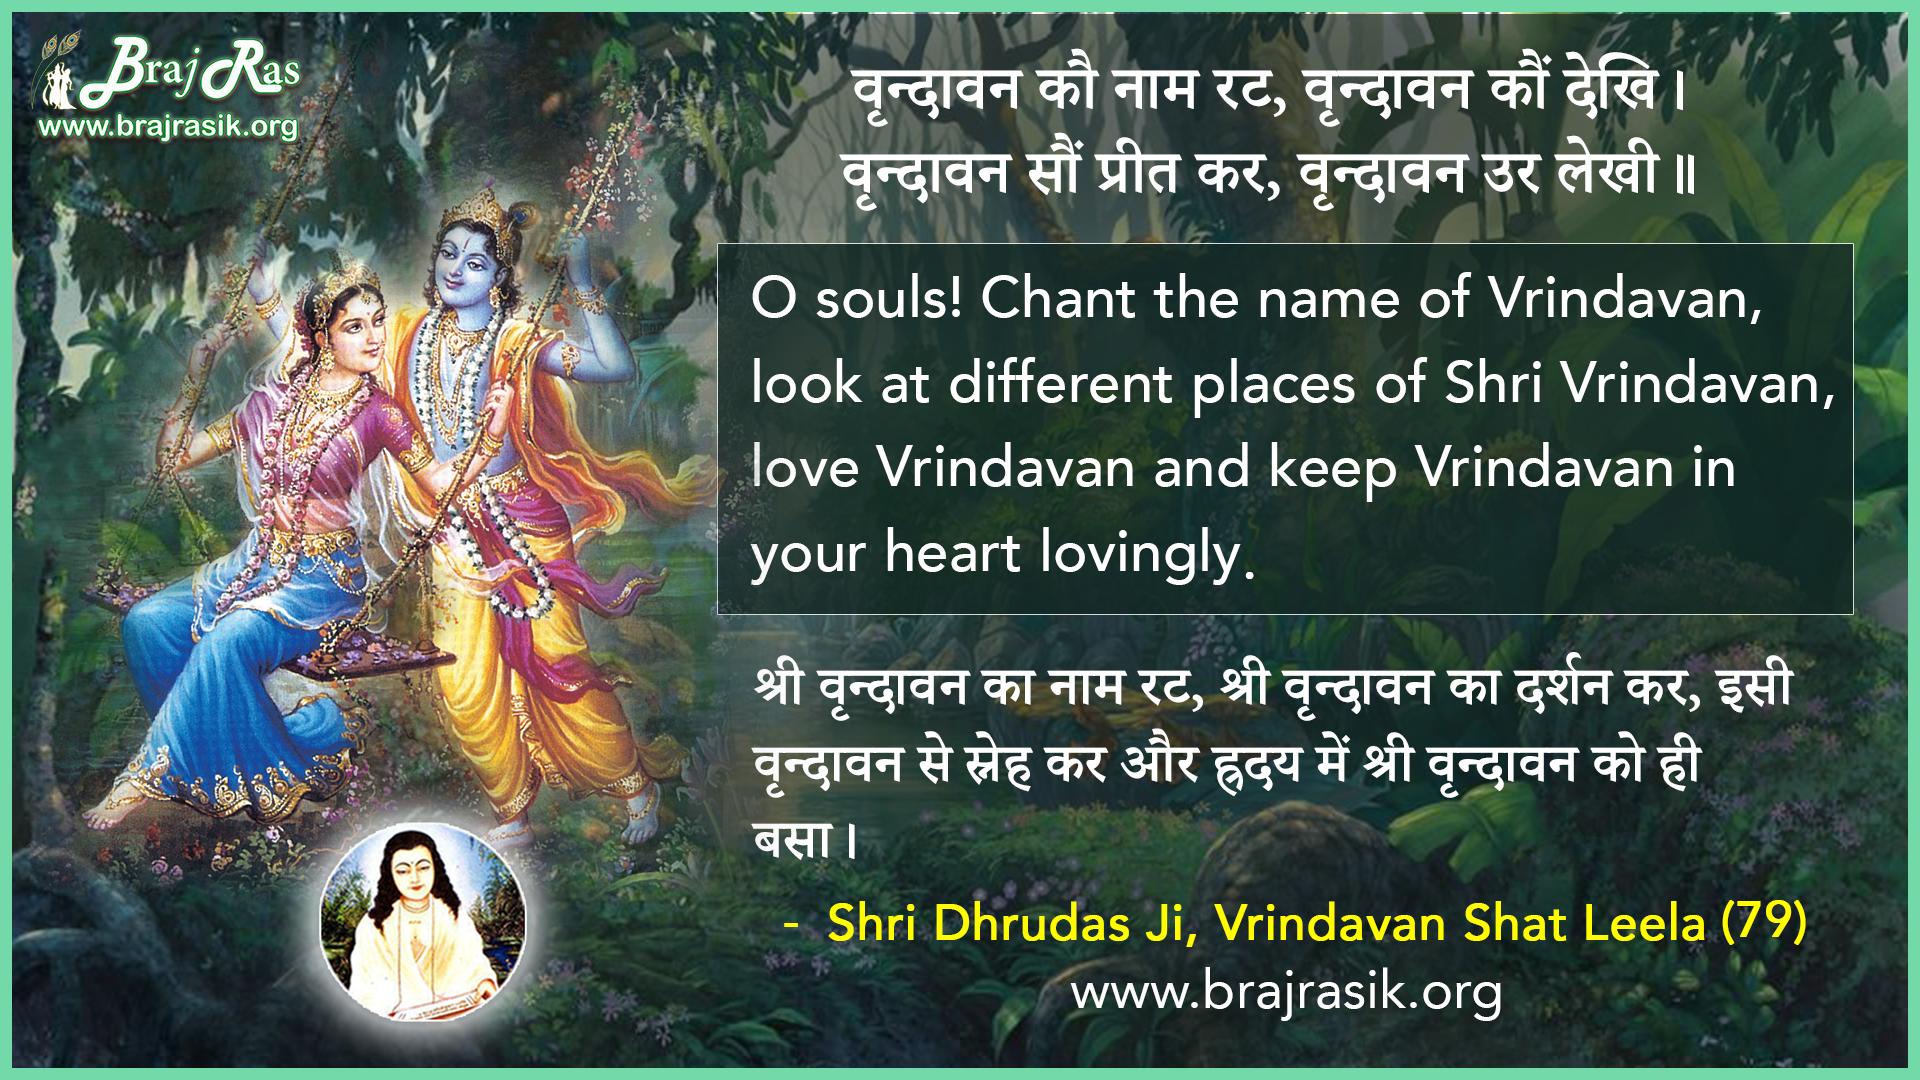 Vrindavan Kau Naam Rat, Vrindavan Kaun Dekhi - Shri Dhruvdas Ji, Vrindavan Shat Leela (79)